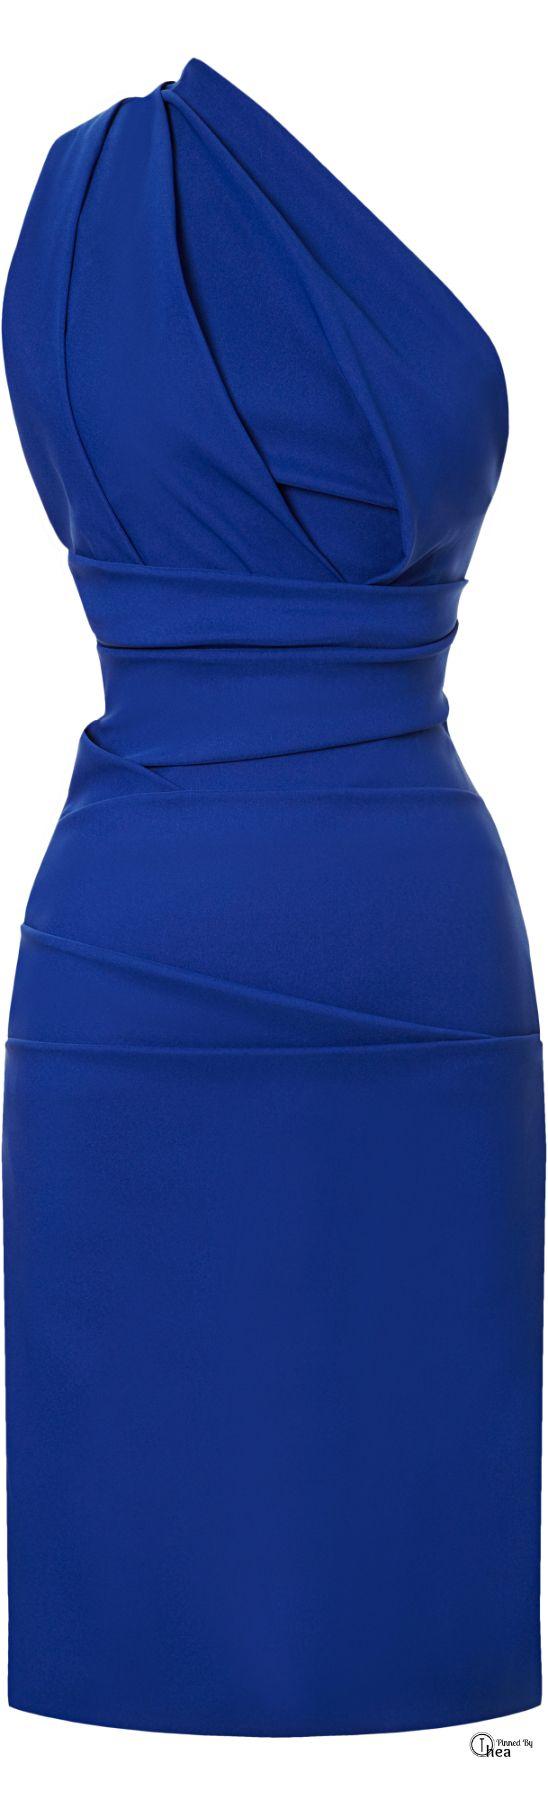 Adorable blue dress!                                                                                                                                                     More